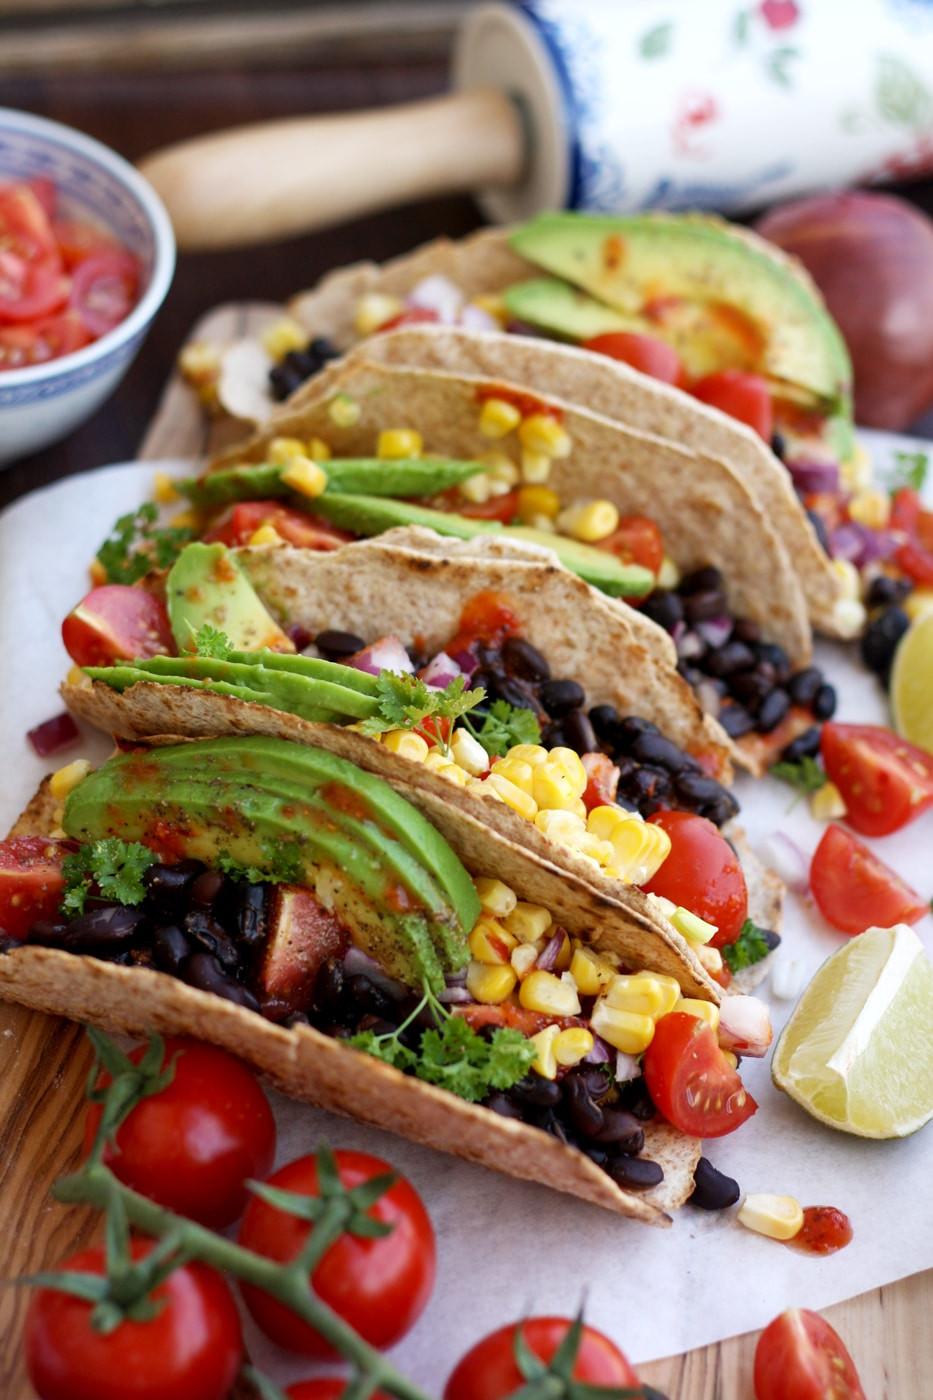 Easy Vegan Tacos  5 minute Easy Vegan Tacos • Happy Kitchen